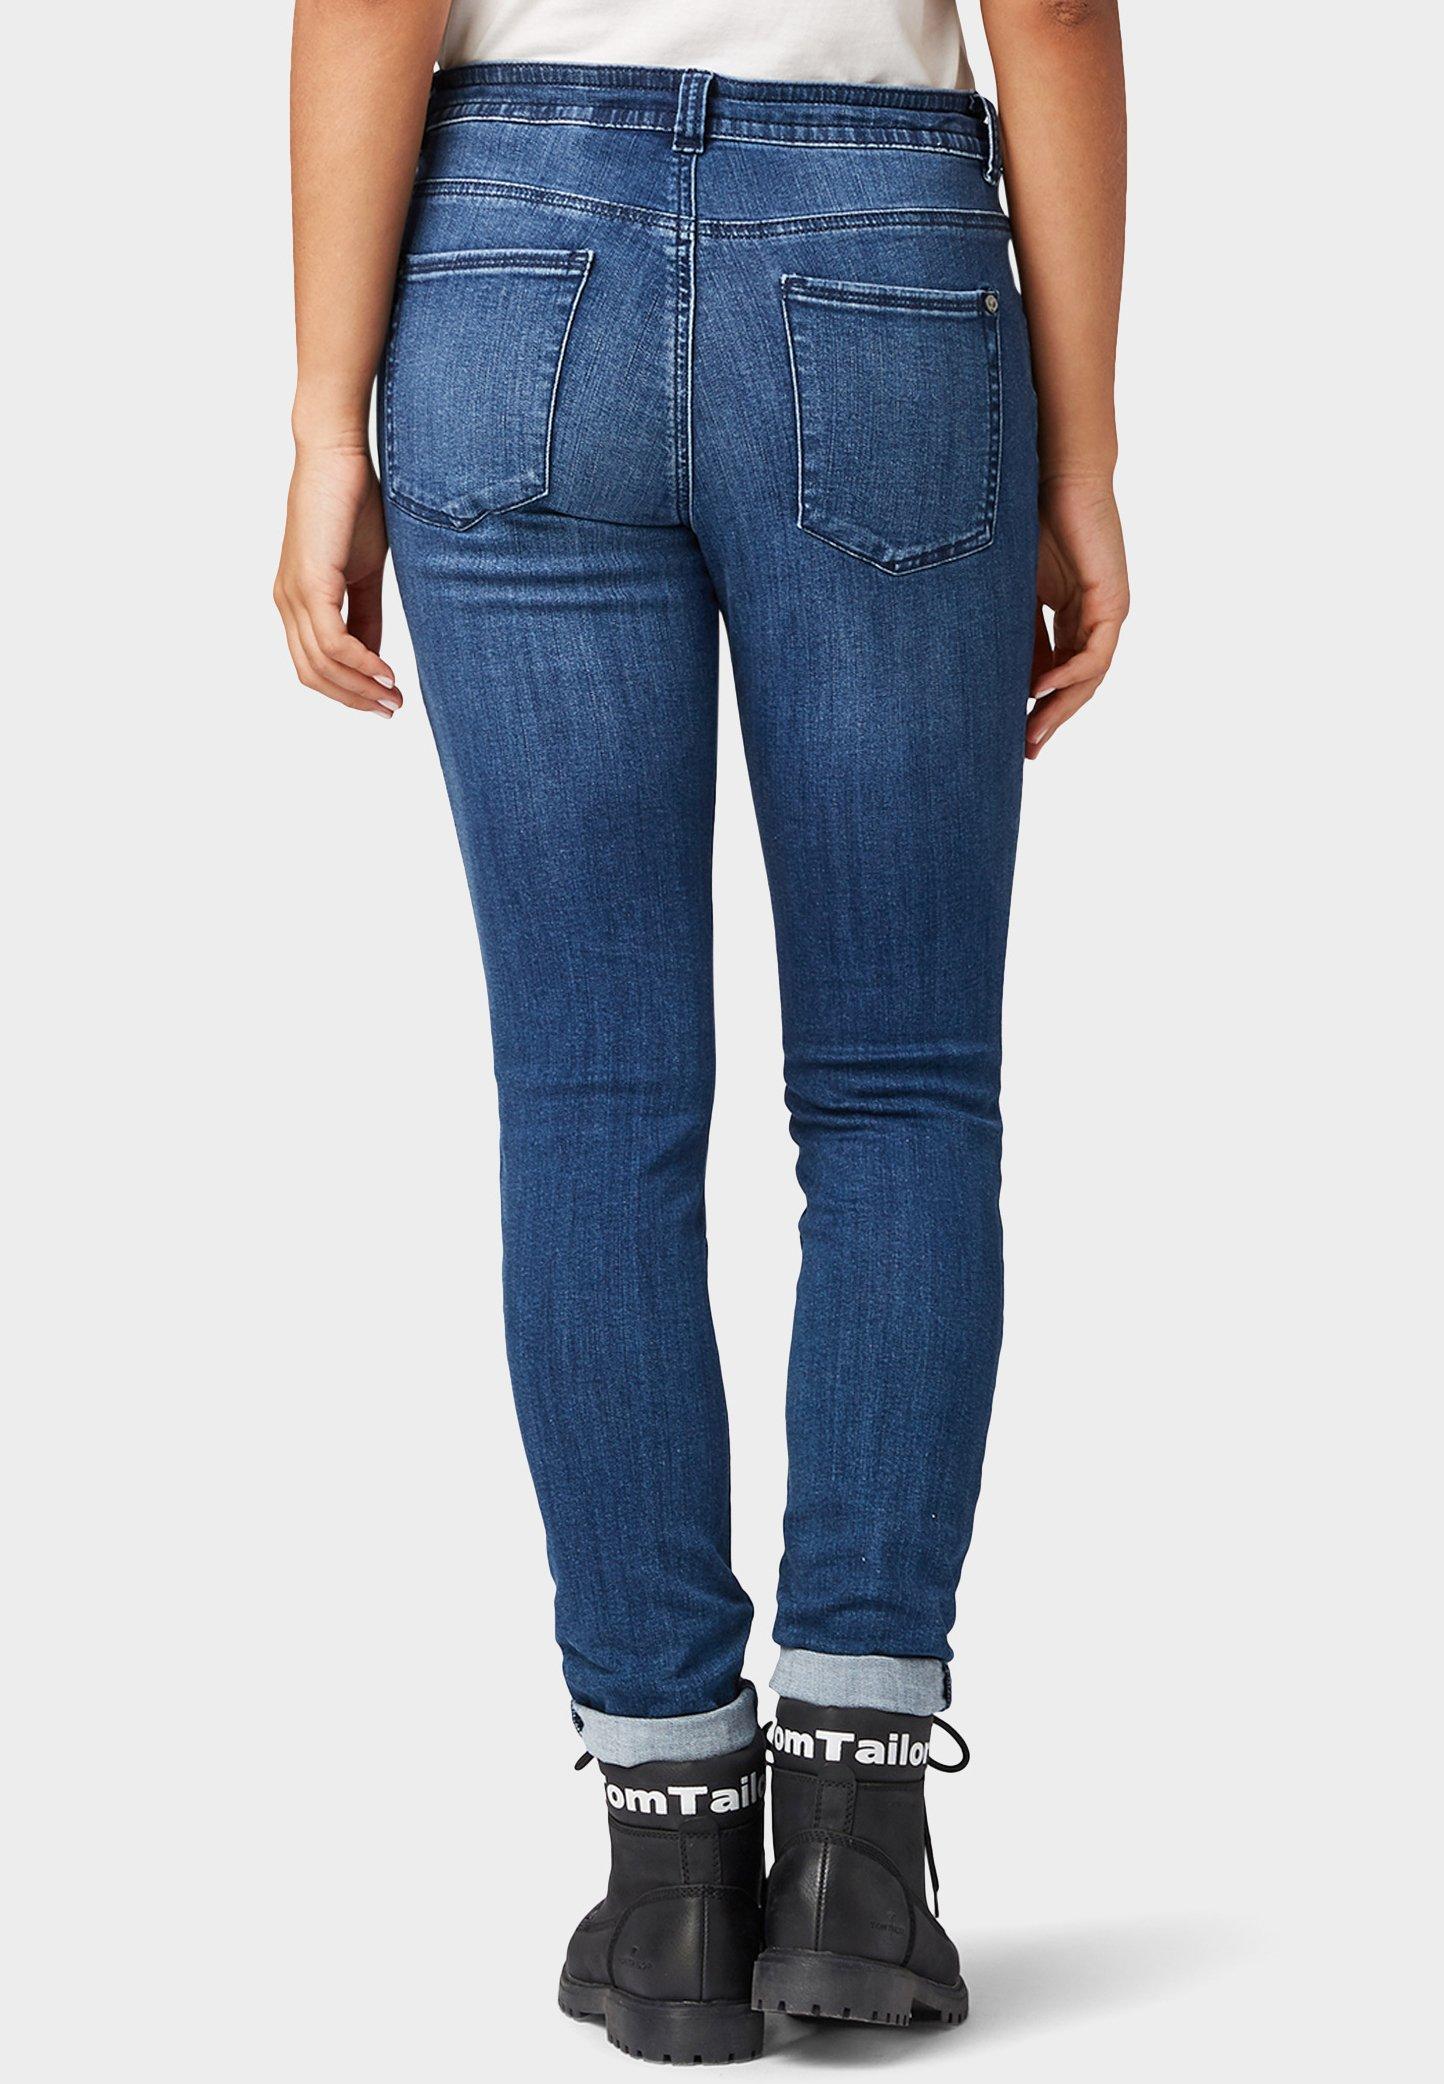 TOM TAILOR Jeans Skinny - mid stone bright blue denim - Jeans Femme 7YPoV